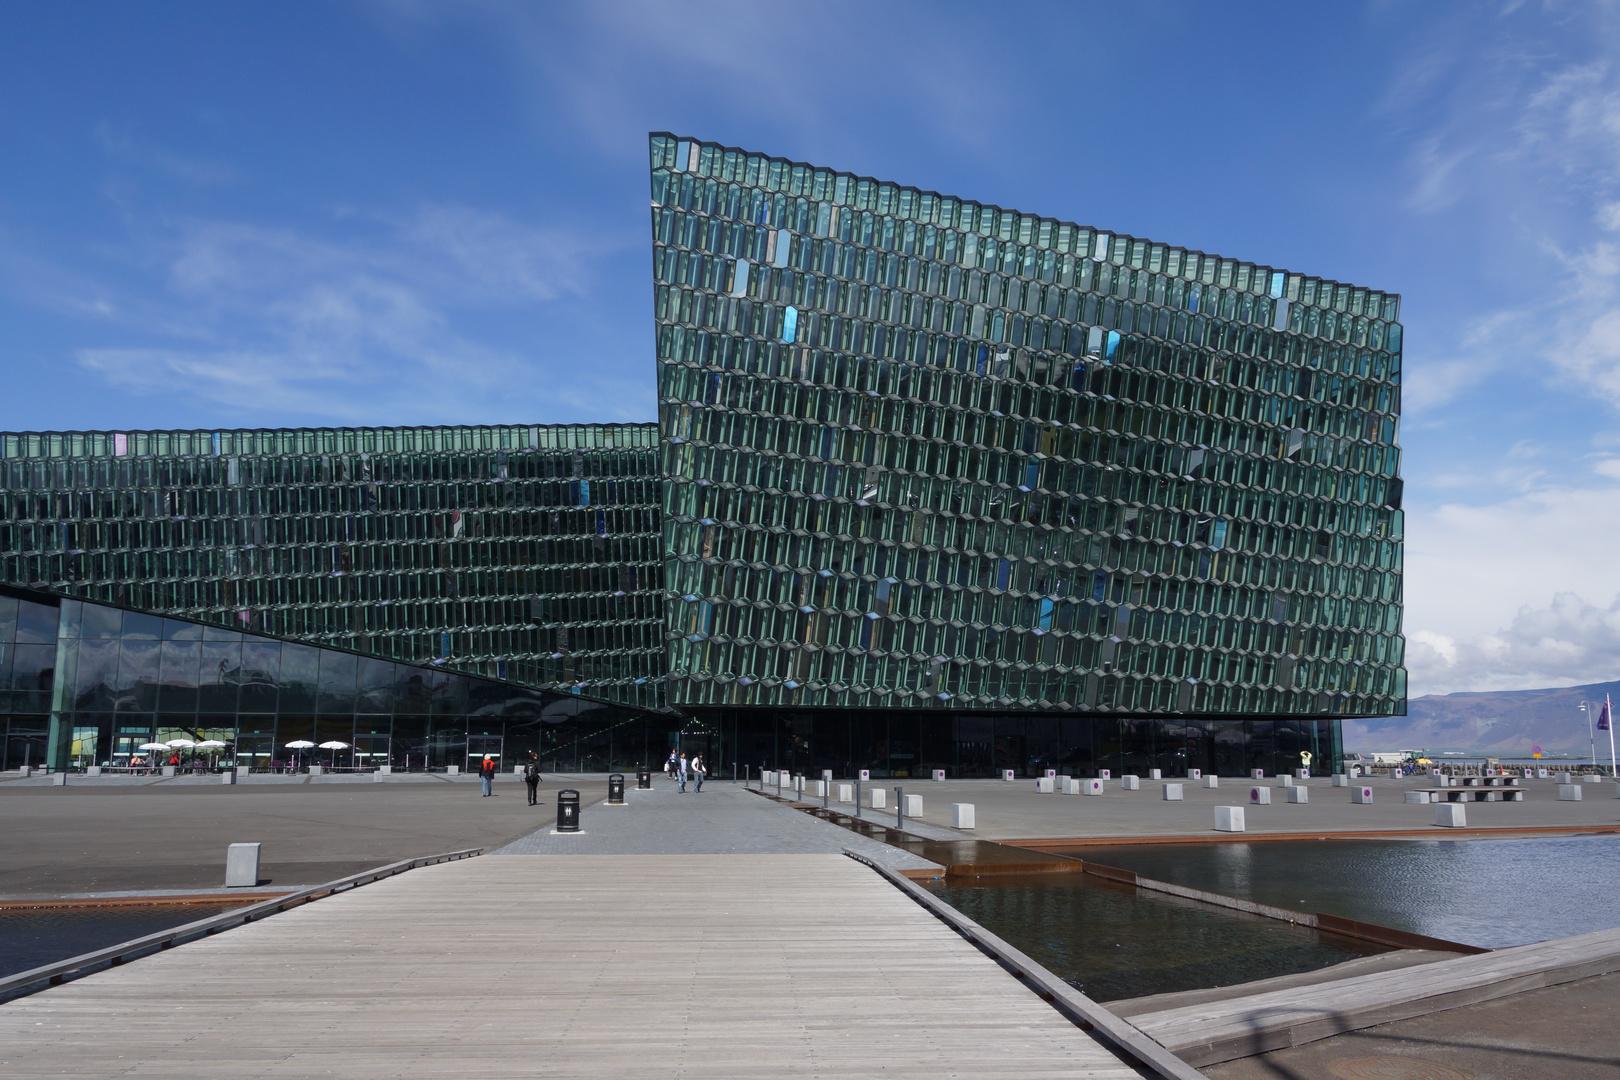 Neues Konzerthaus HARPA in Reykjavik